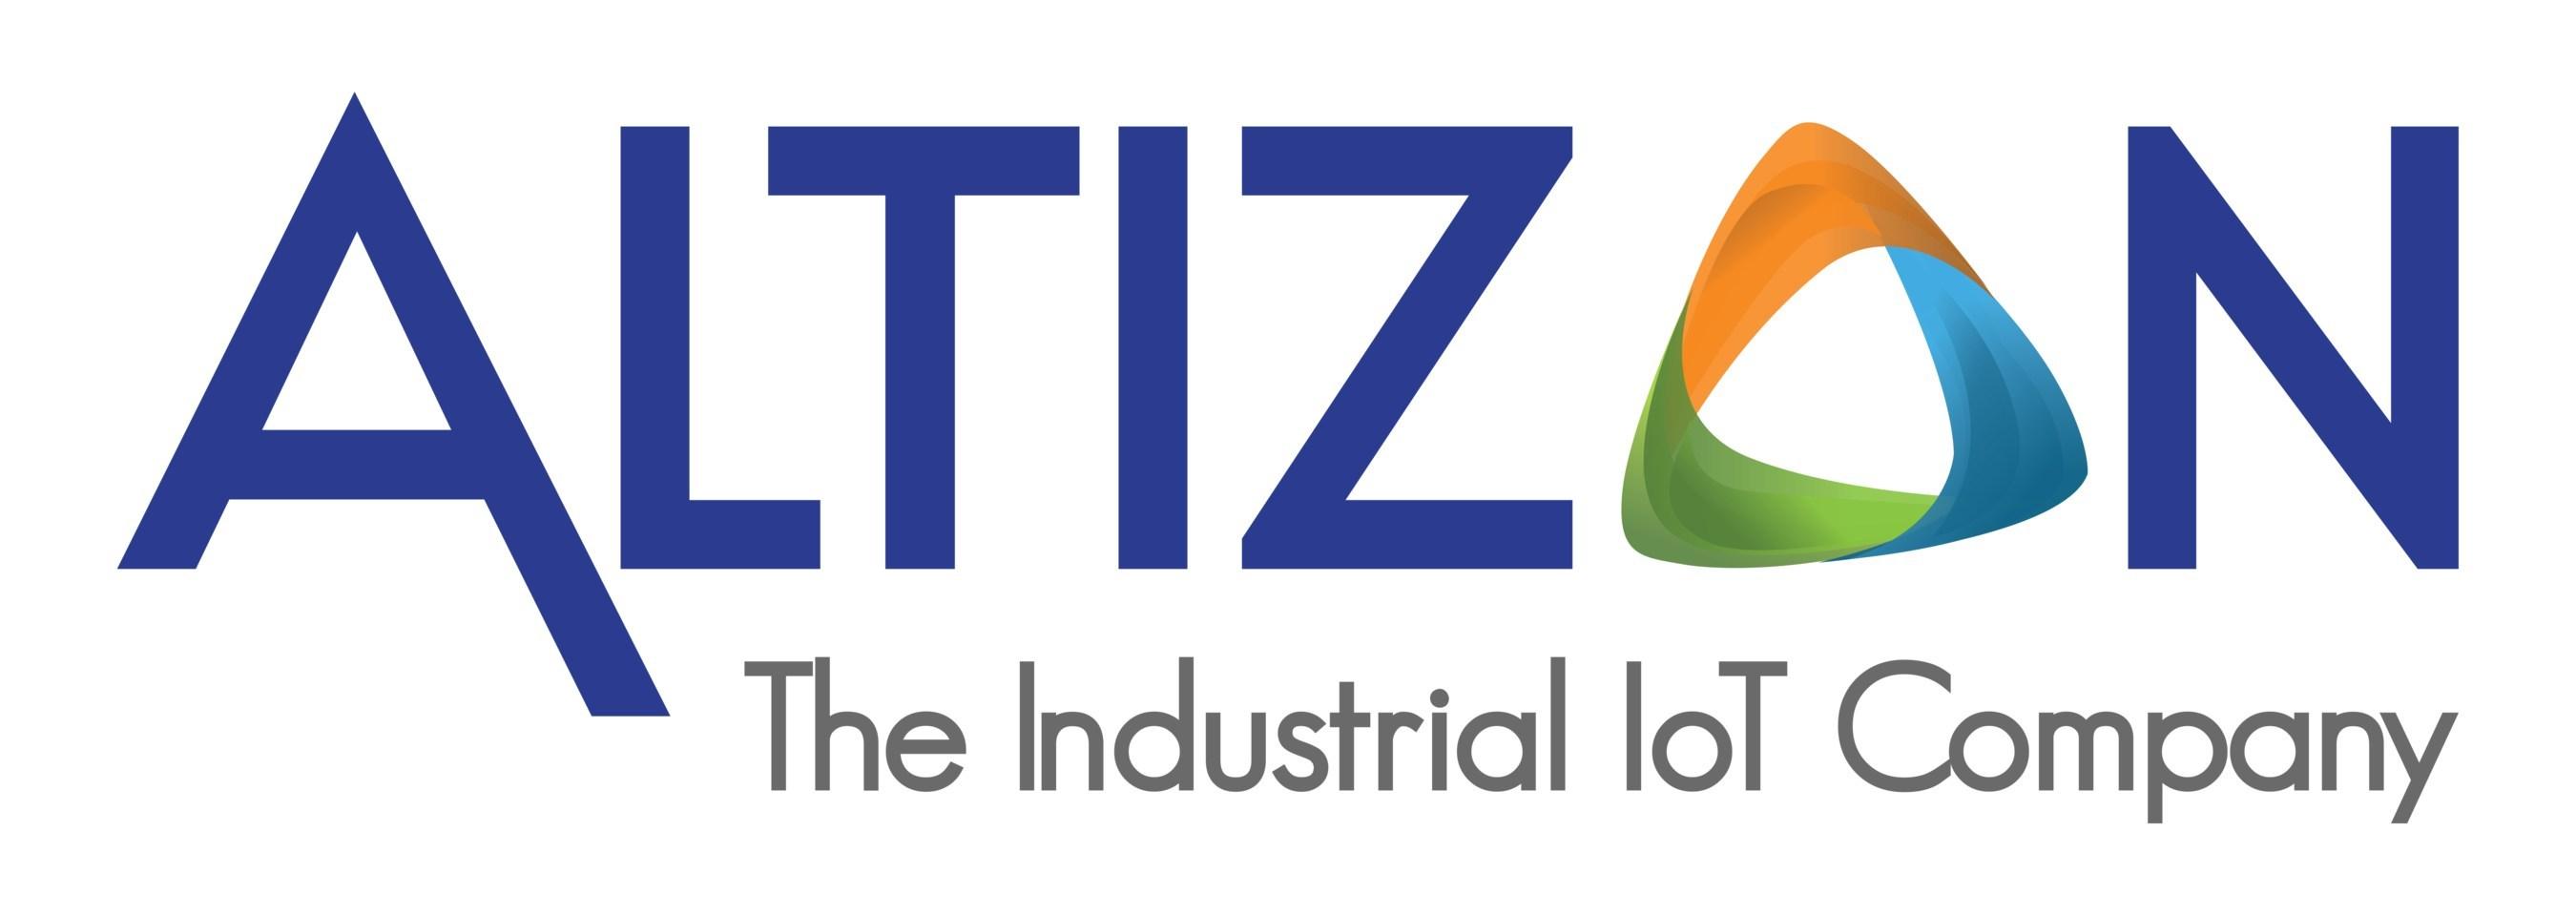 Altizon is a global industrial IoT (IIoT) platform company creating connected intelligence for enterprises (PRNewsfoto/Altizon)